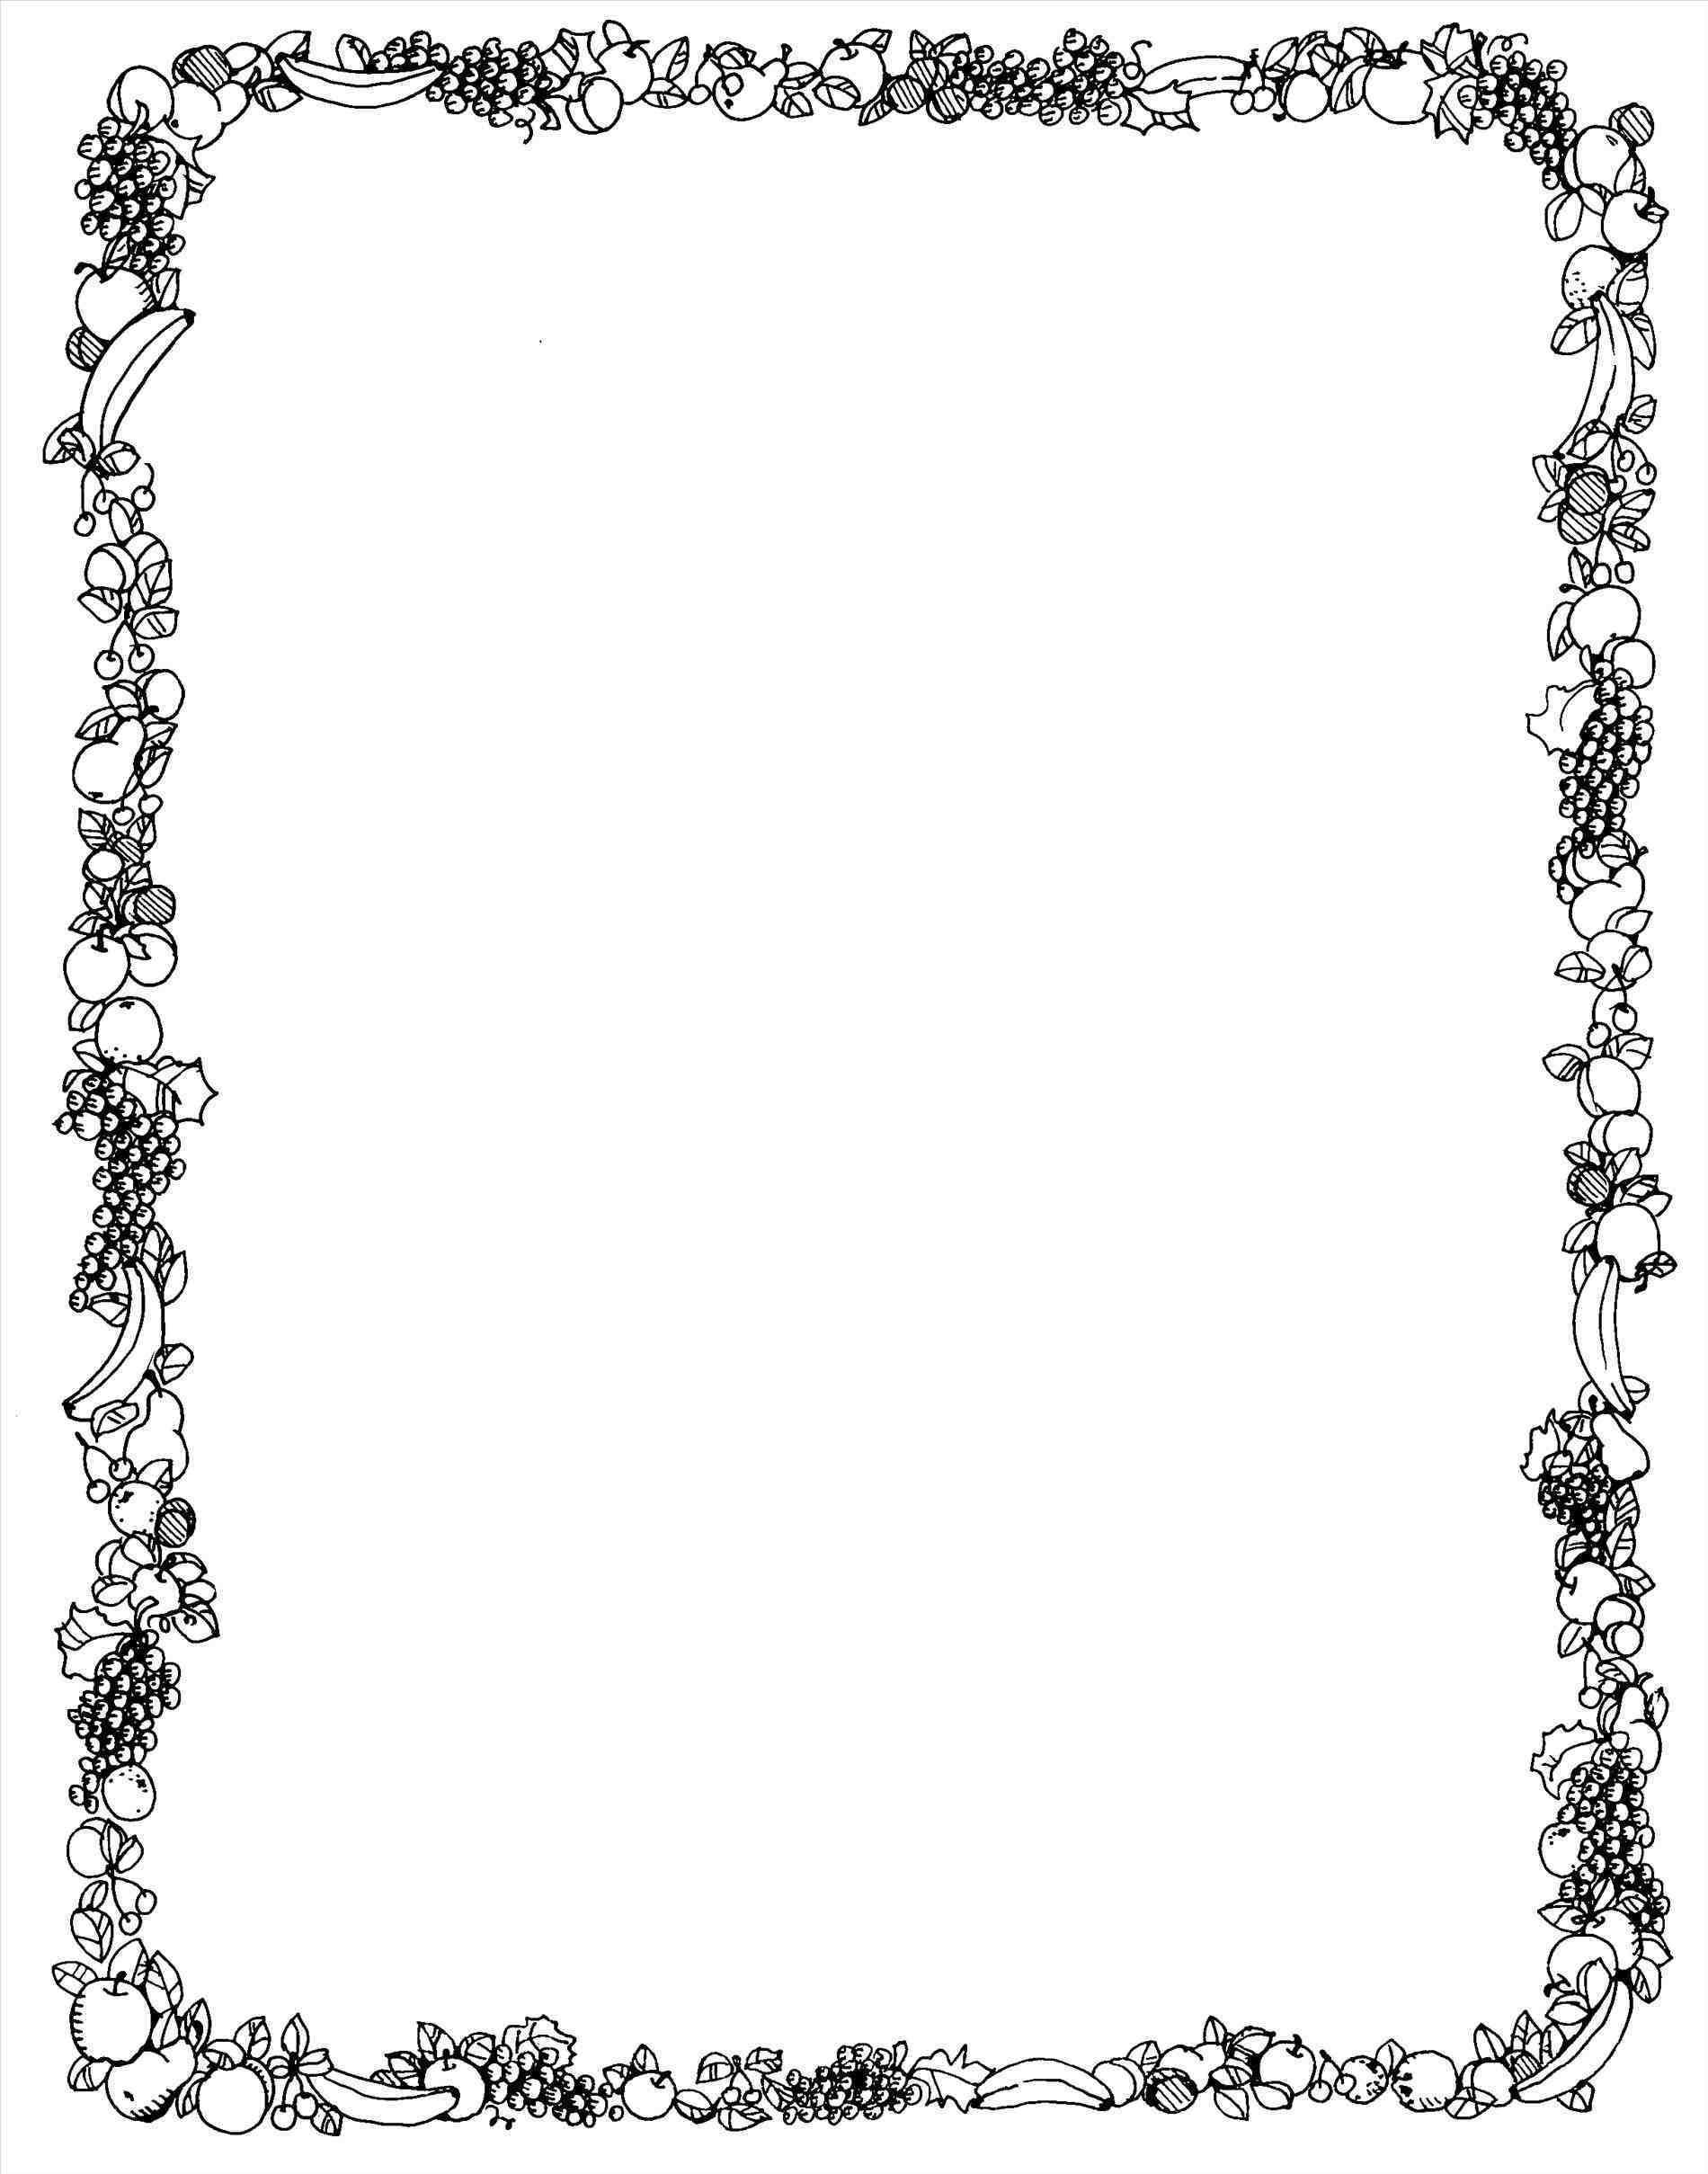 Printable Free Printable Border Templates Bordered Paper Designs - Free Printable Border Paper